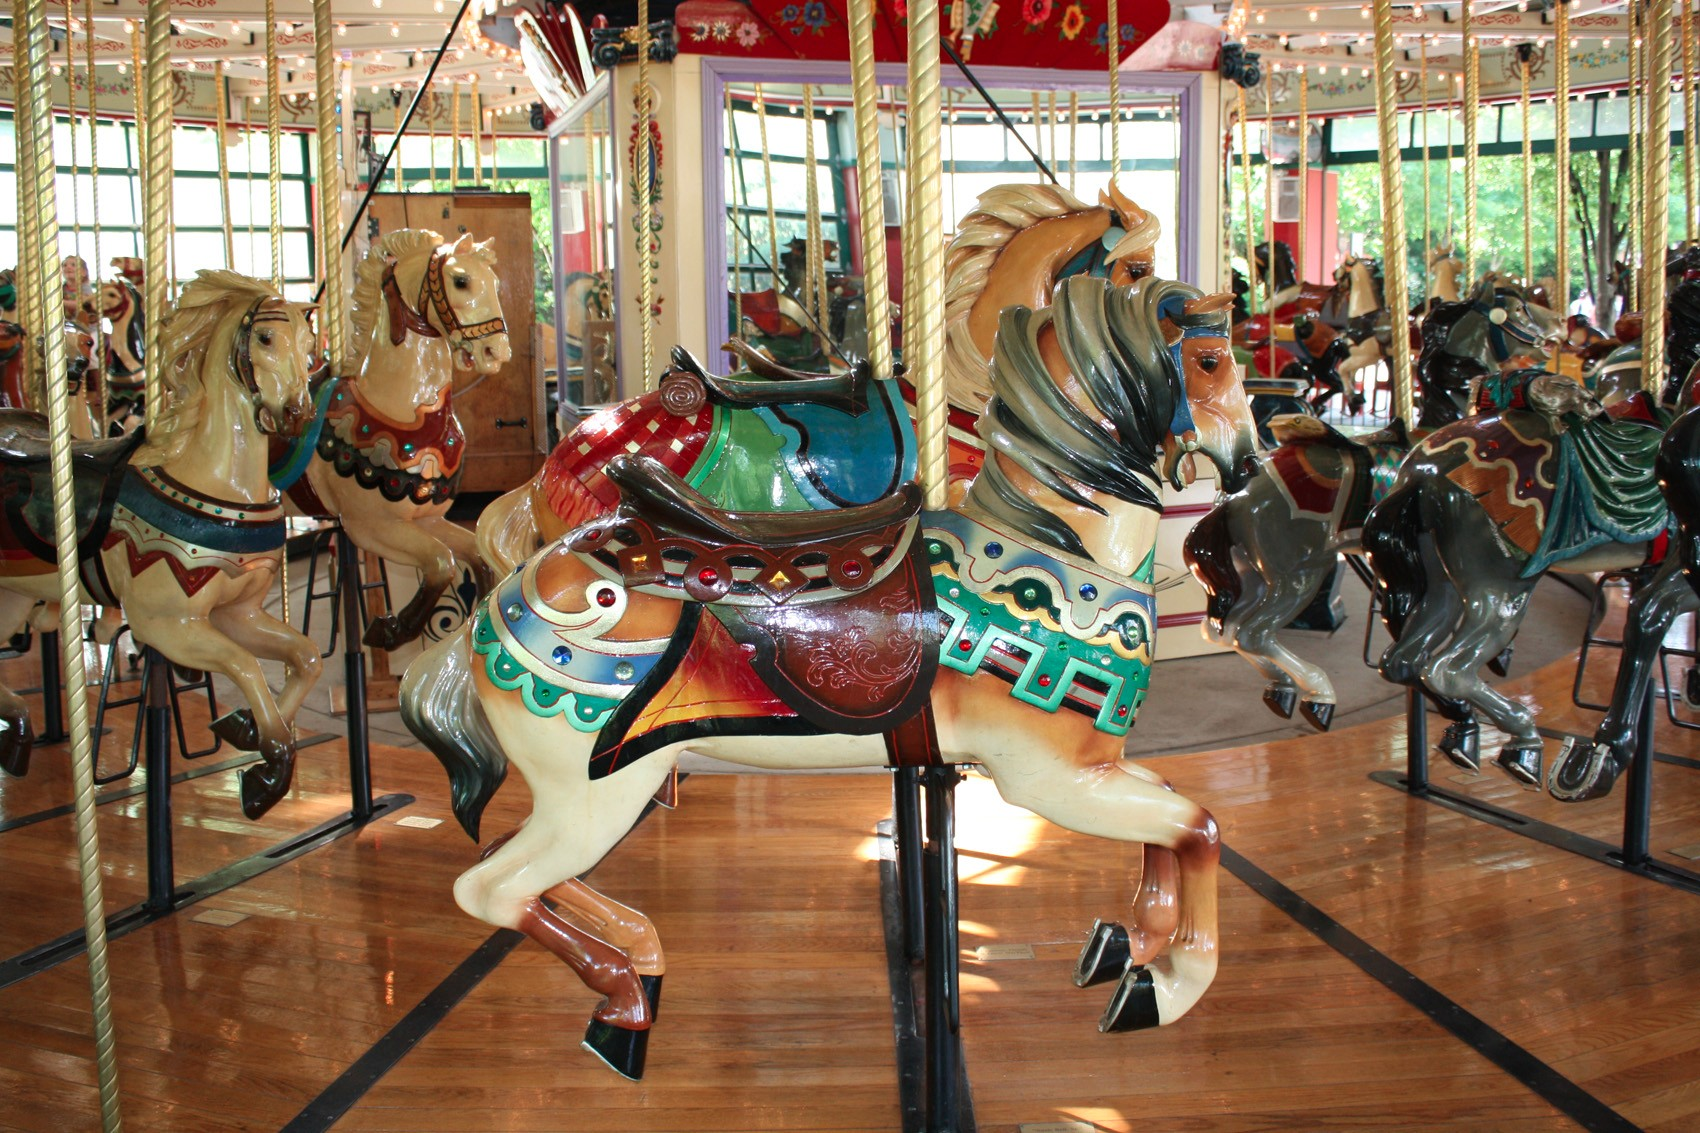 1914-Mangels-Illions-Columbus-Zoo-carousel-horse